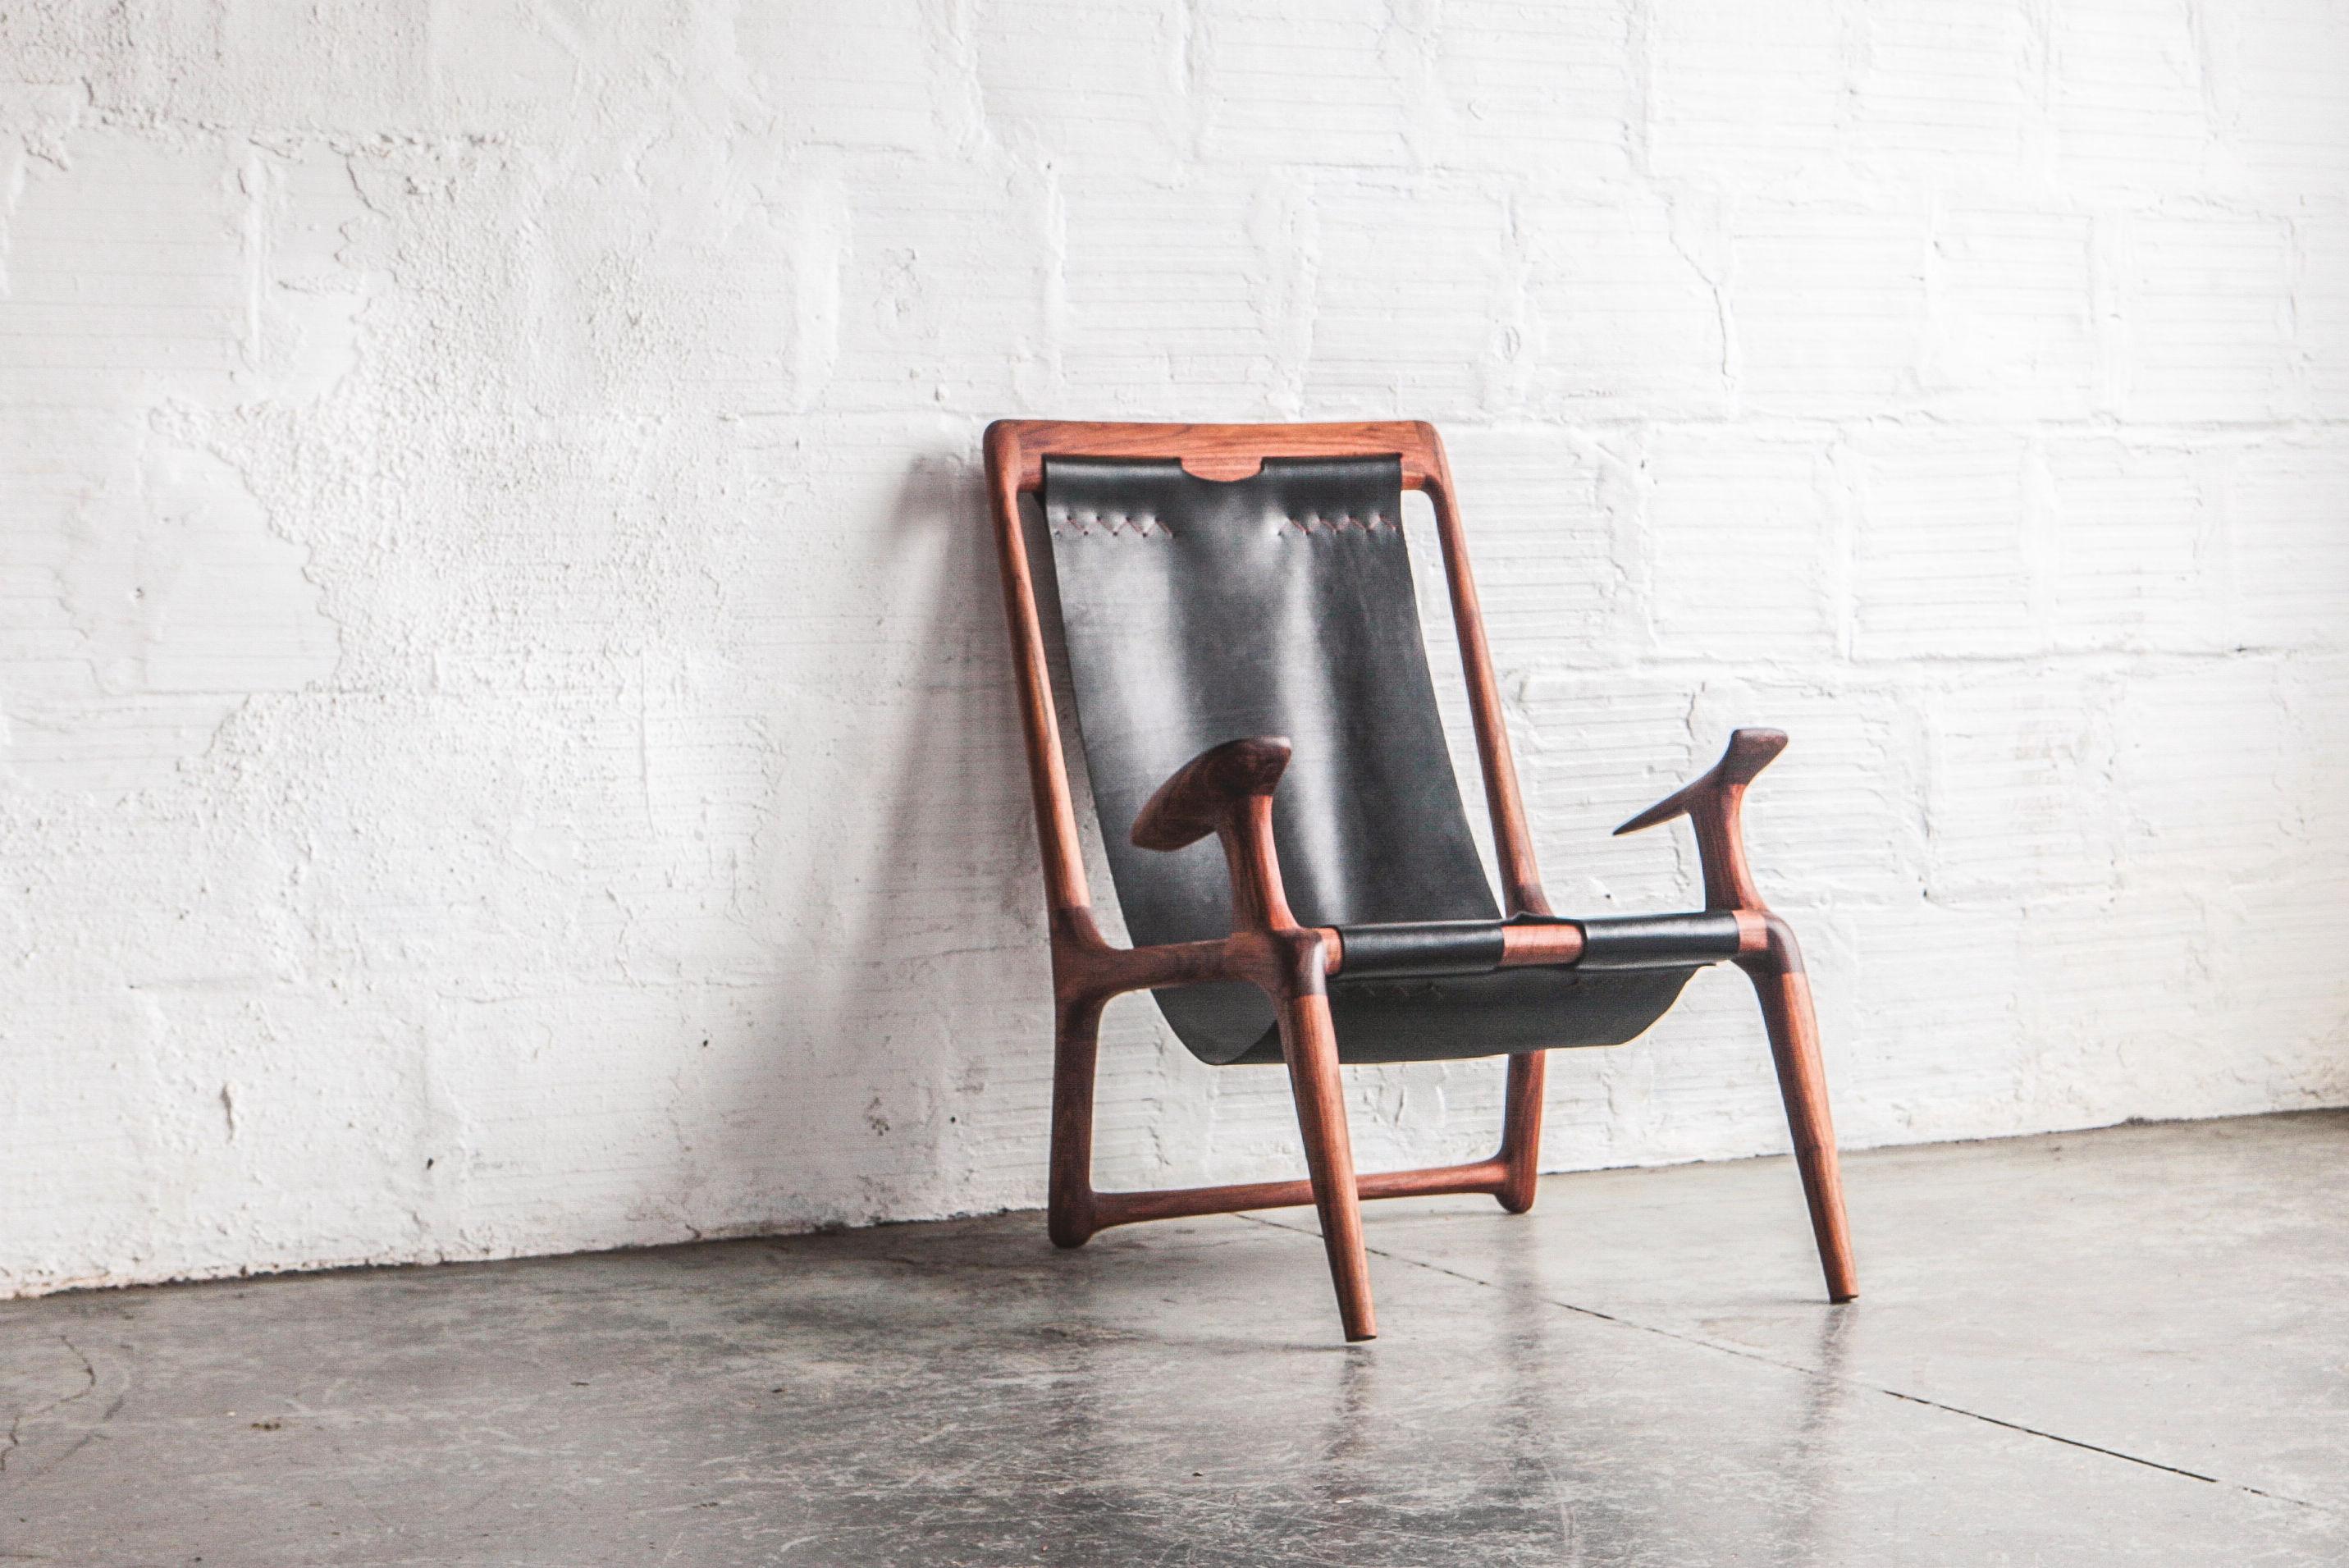 0418 show tell fernweh sling chair krzagy